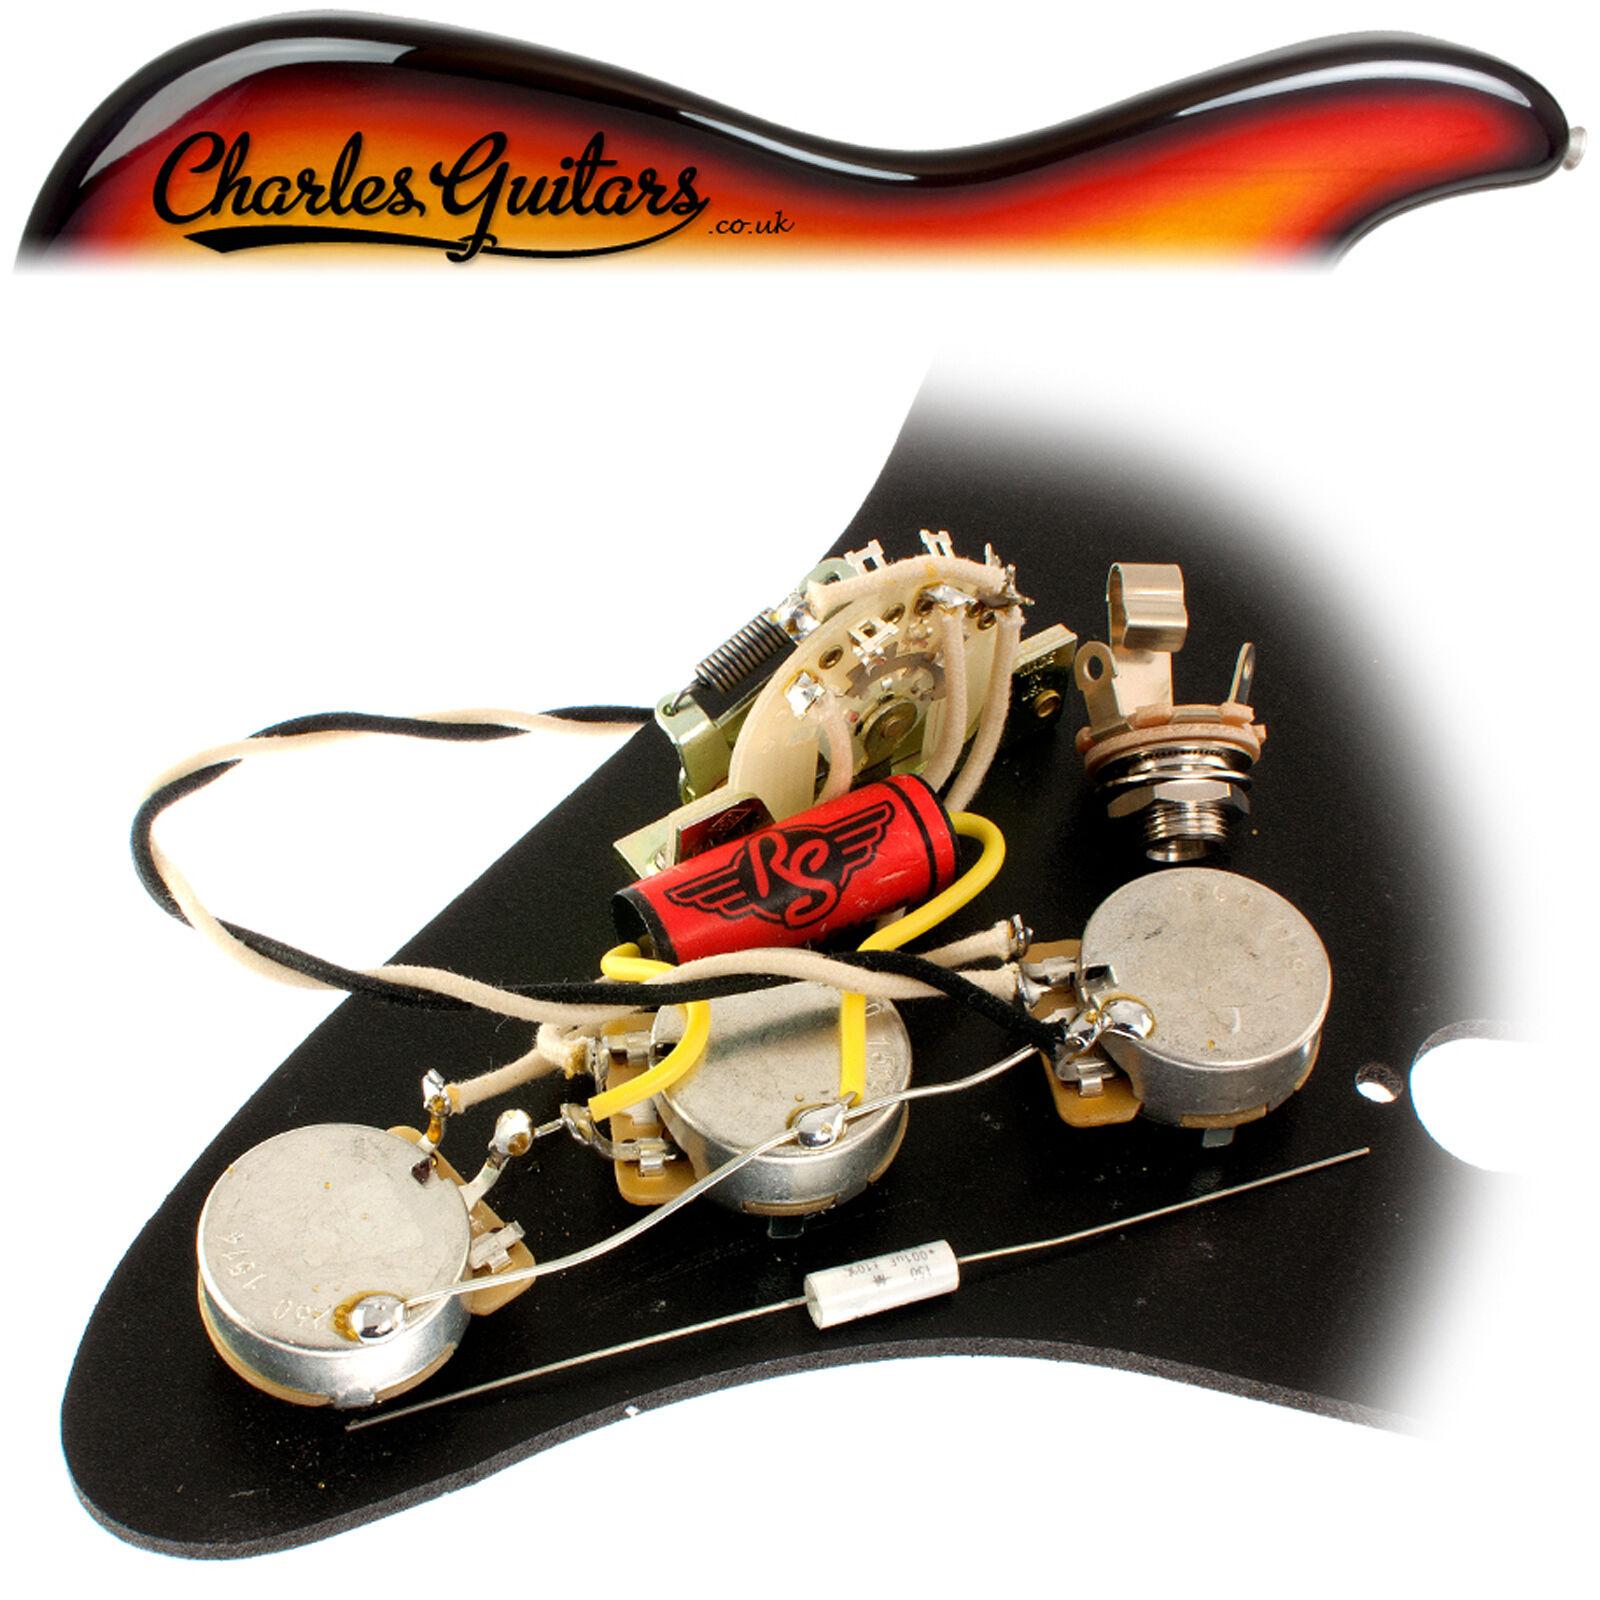 Rs Guitarworks Strat Klassischer Vorverkabelt Aufrüstsatz (RS16011)